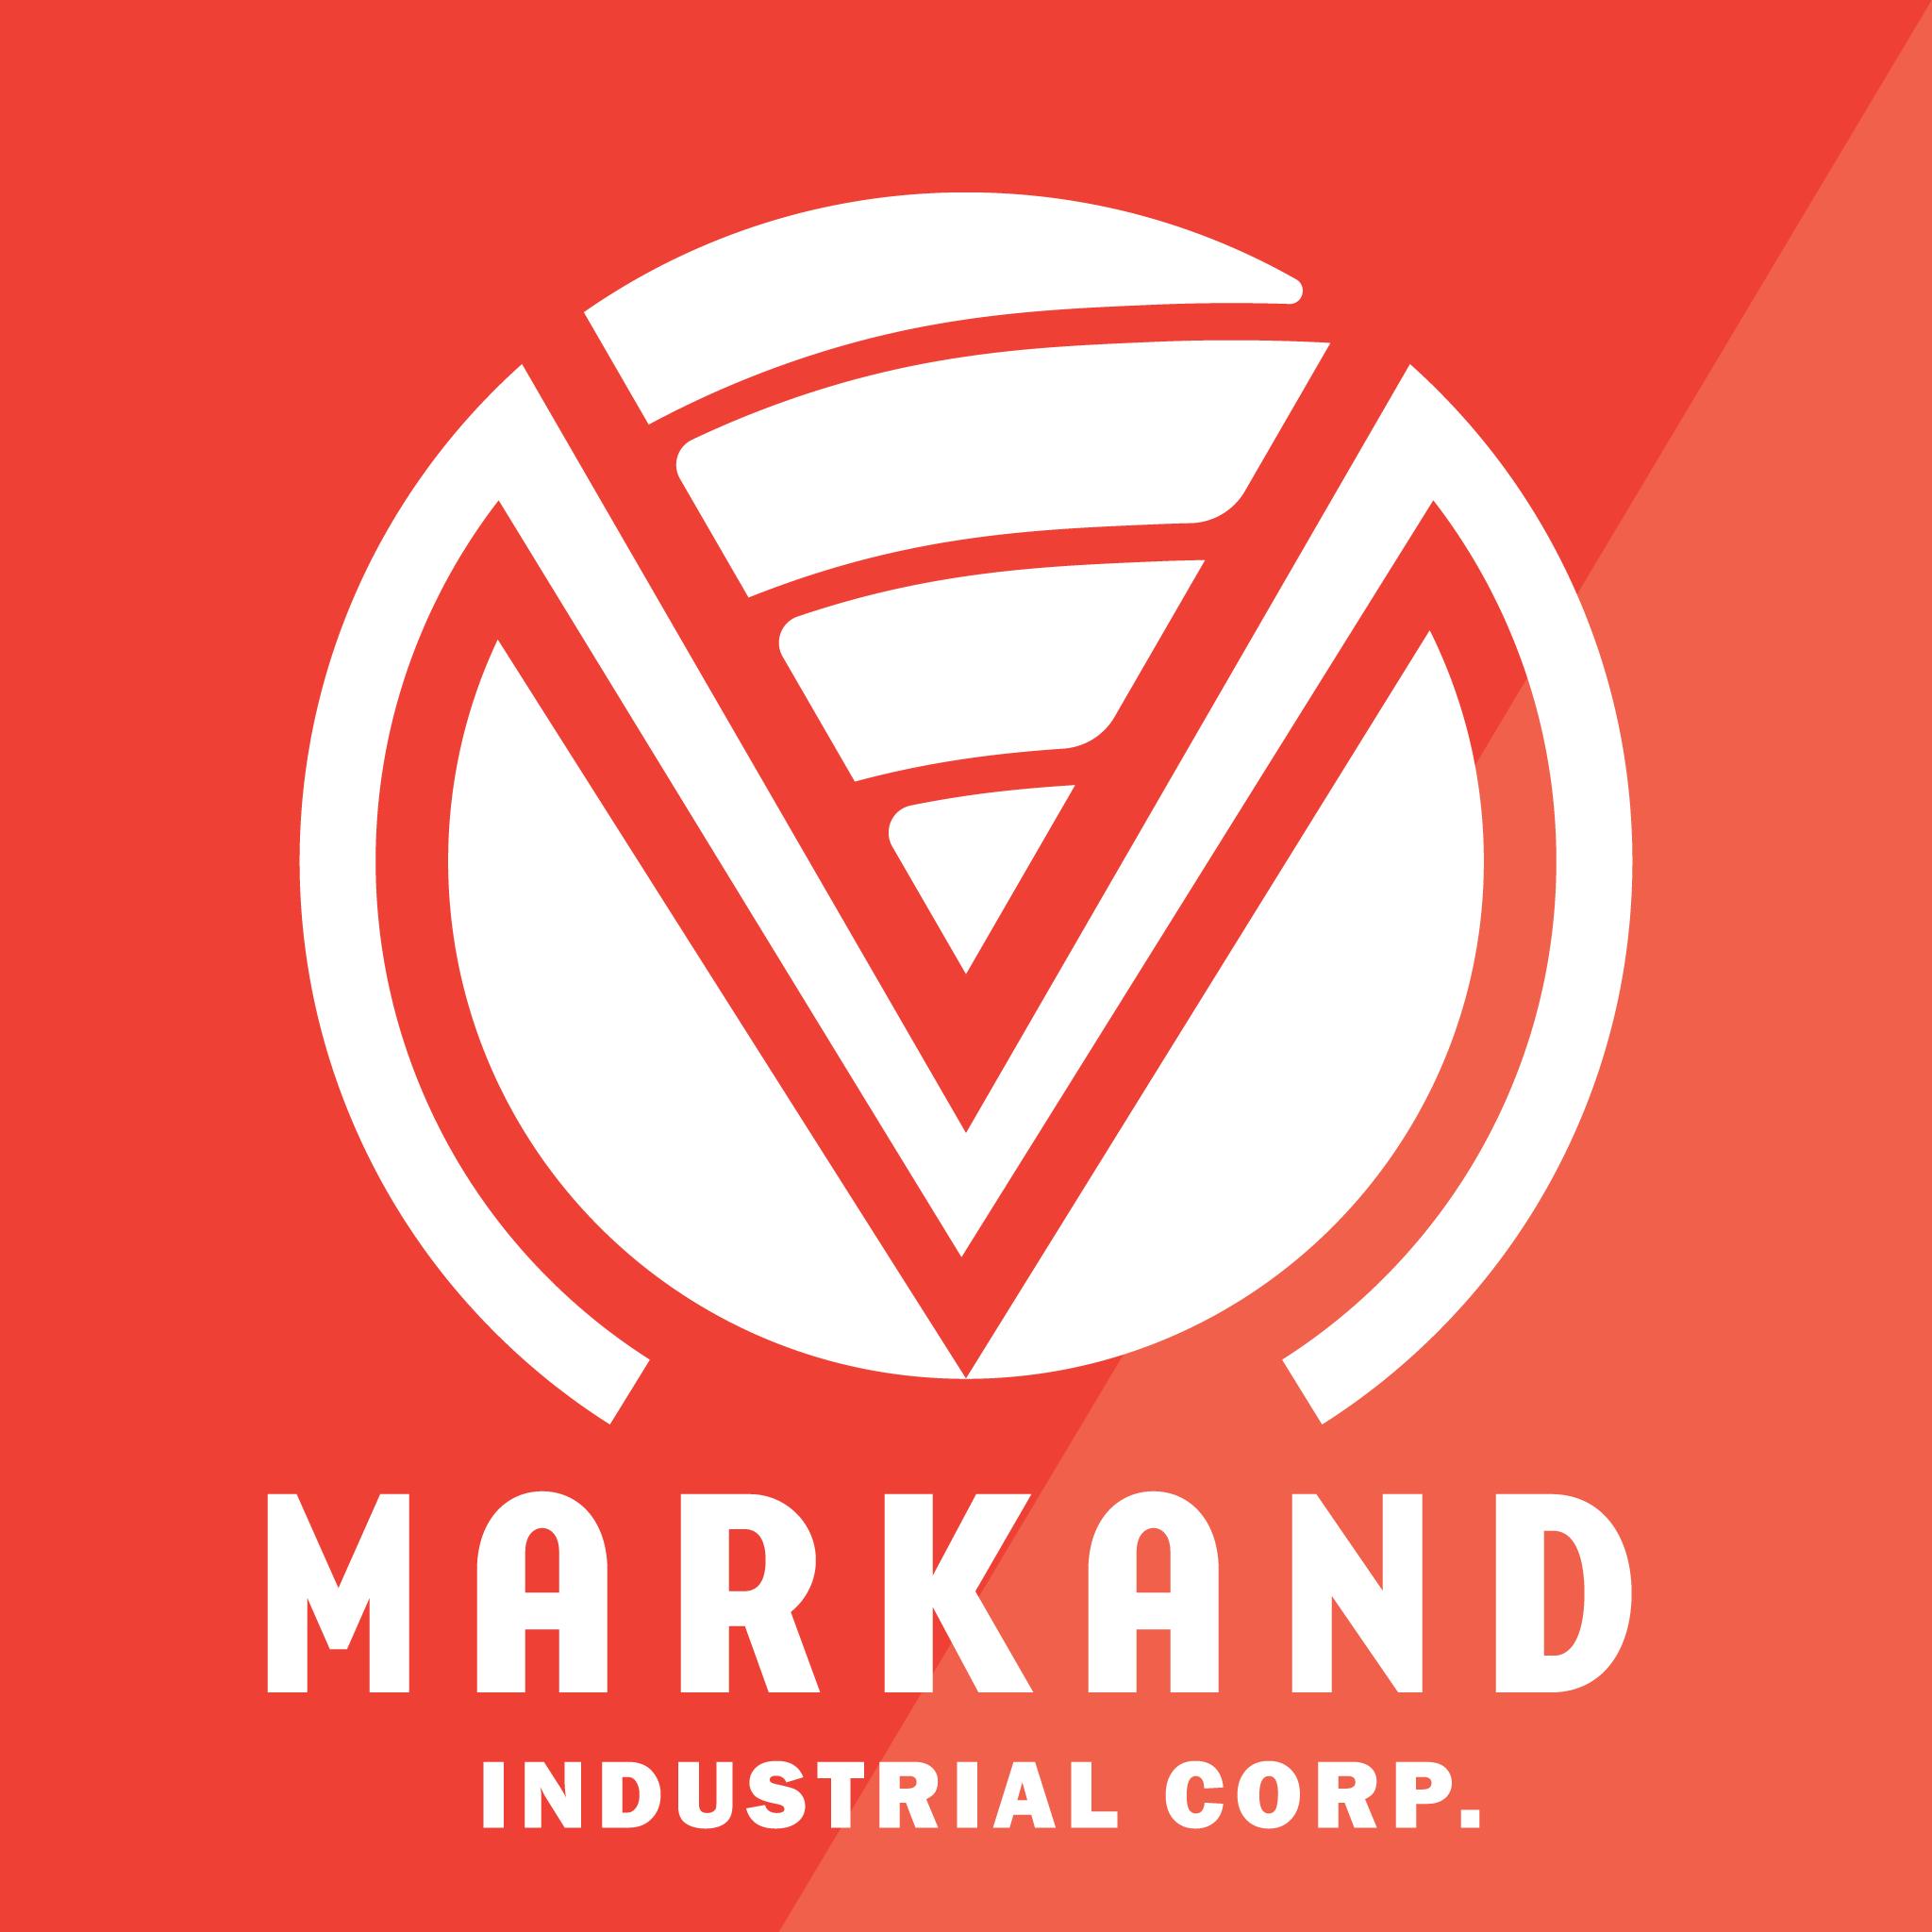 MarkandIndustrialColor.png